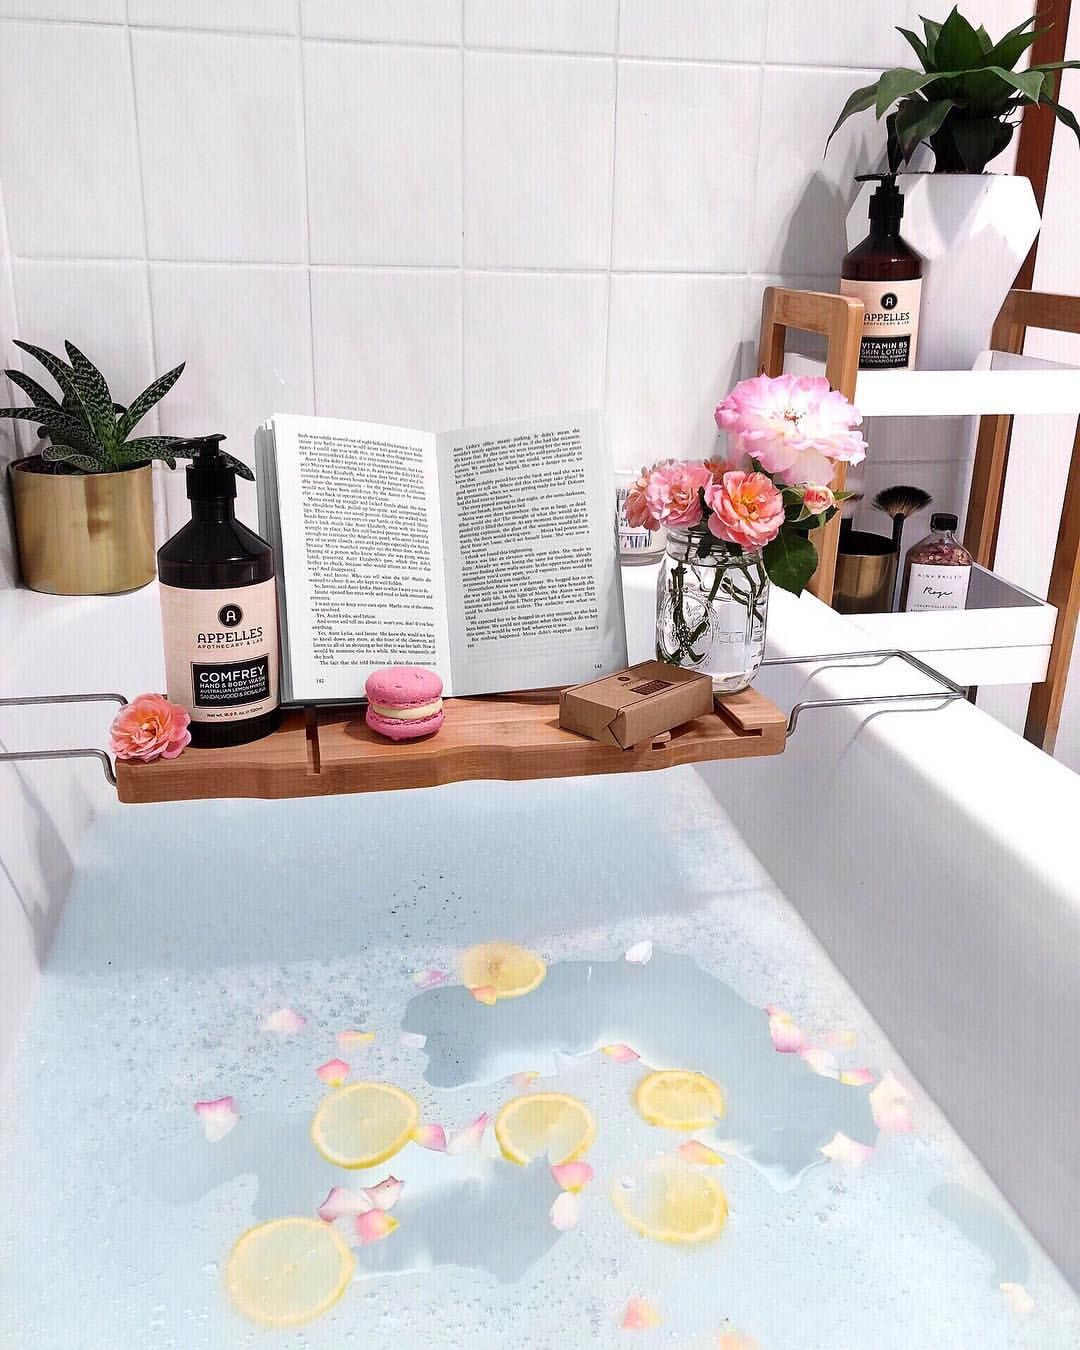 Kmart bath caddy bathroom styling inspiration via @leerachel